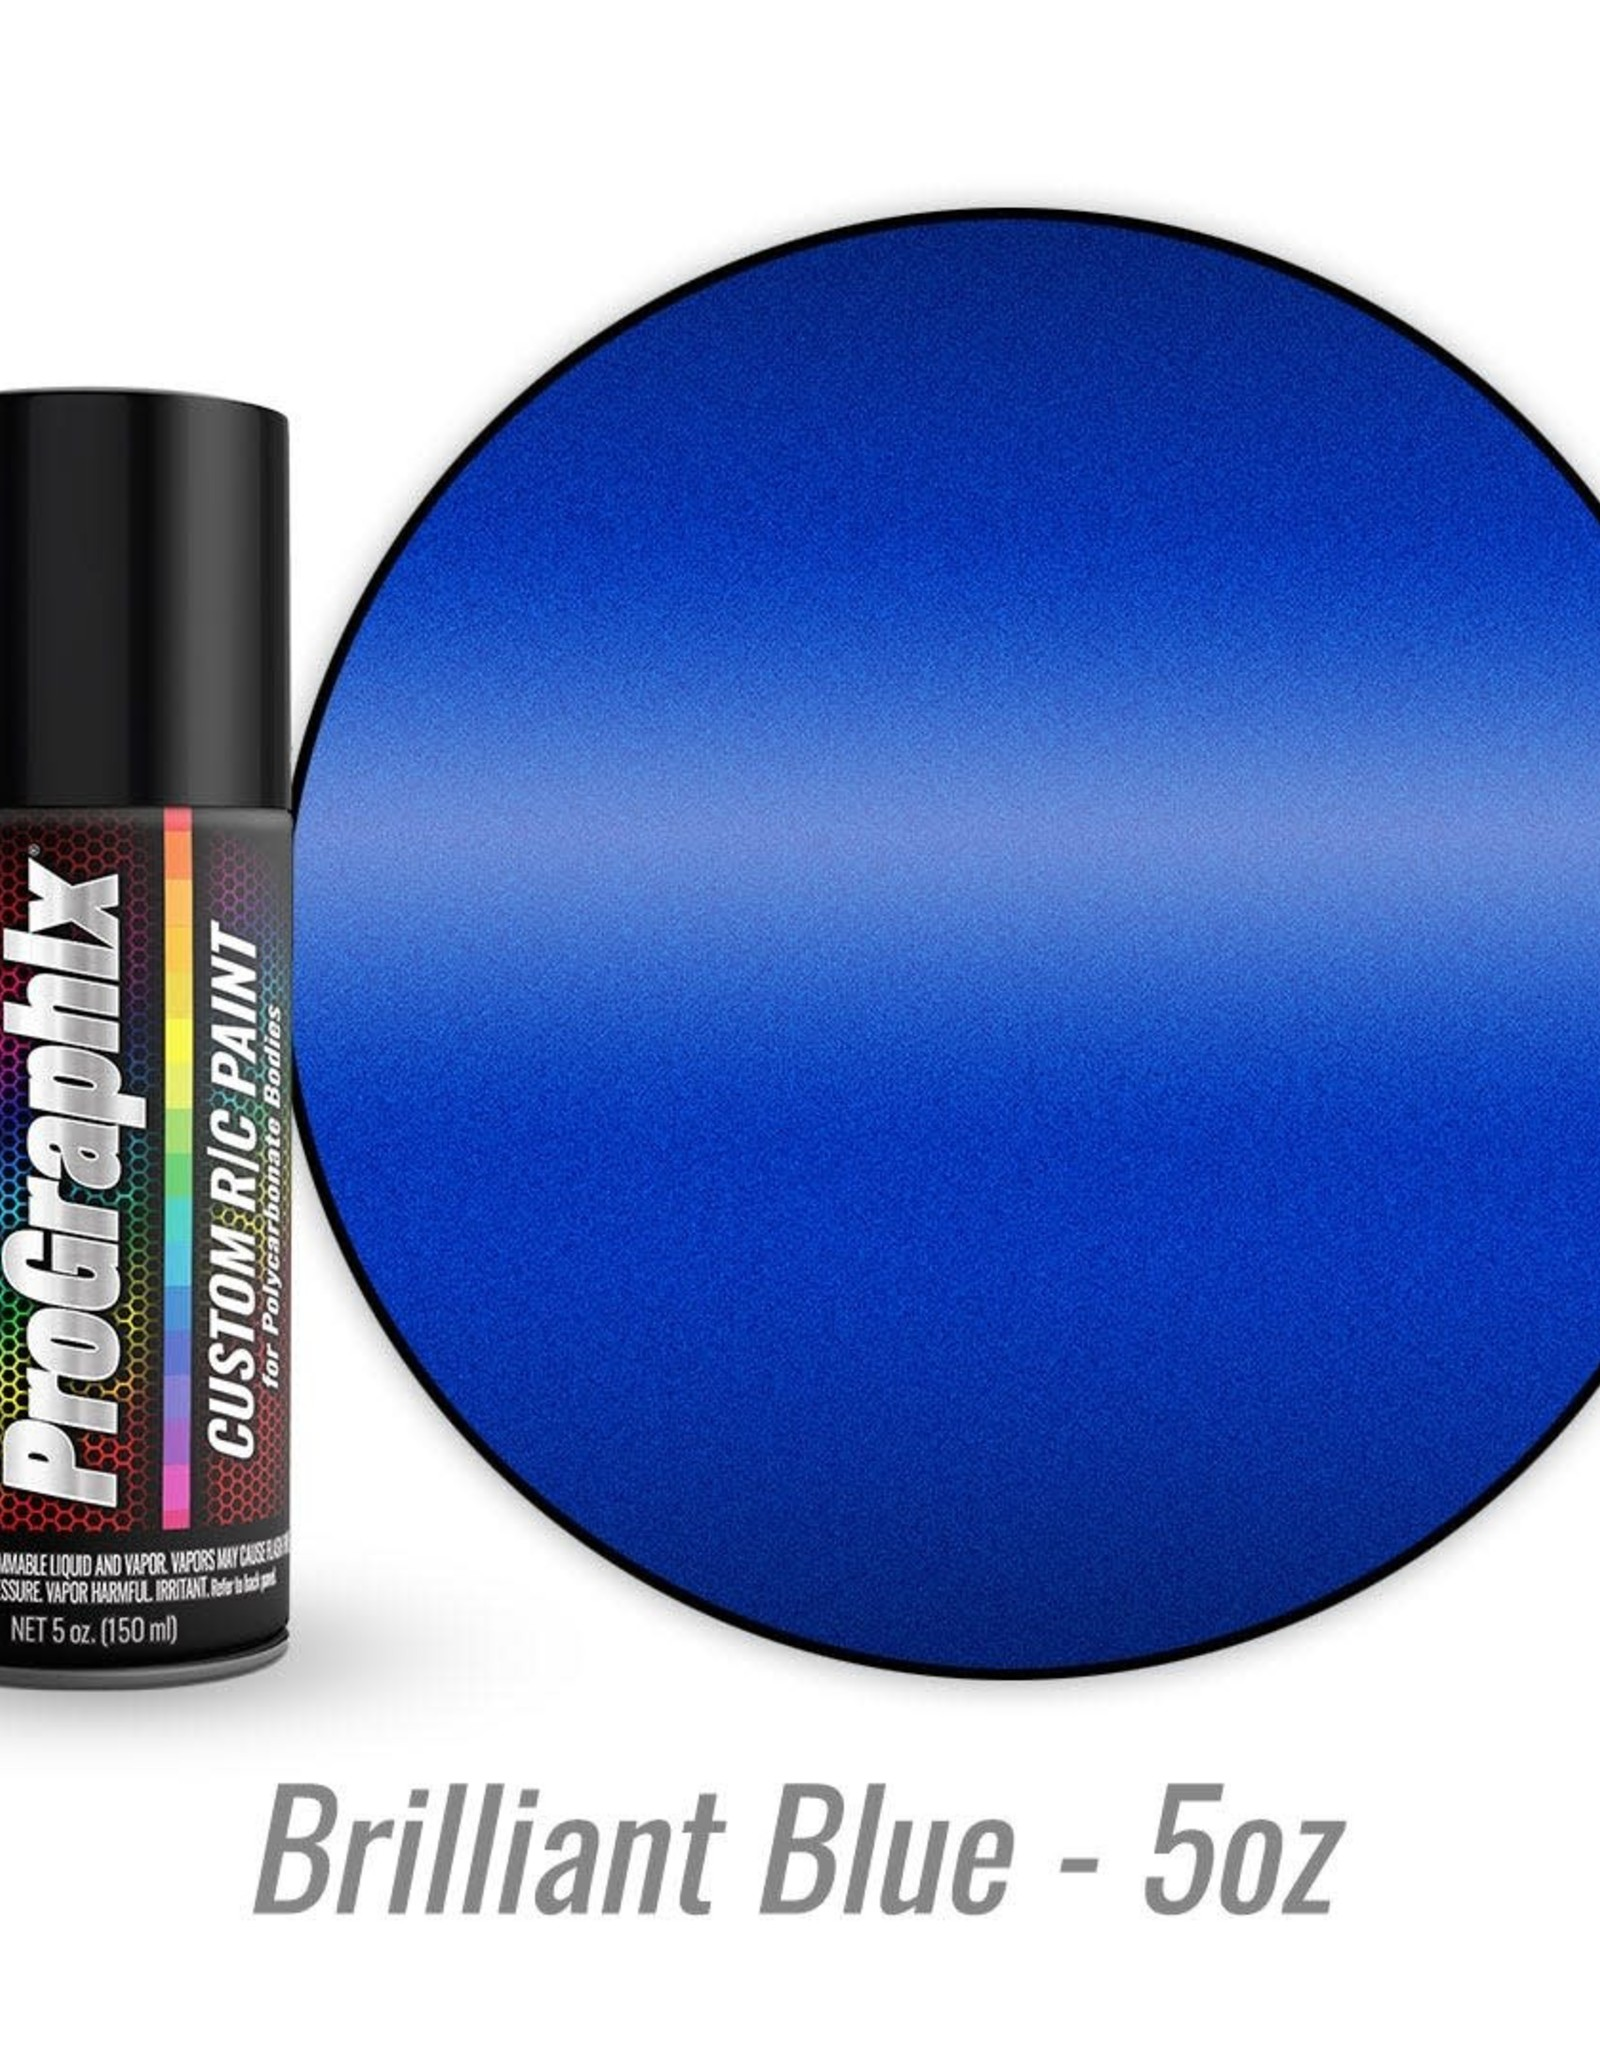 TRAXXAS Body paint, Brilliant Blue (5oz)